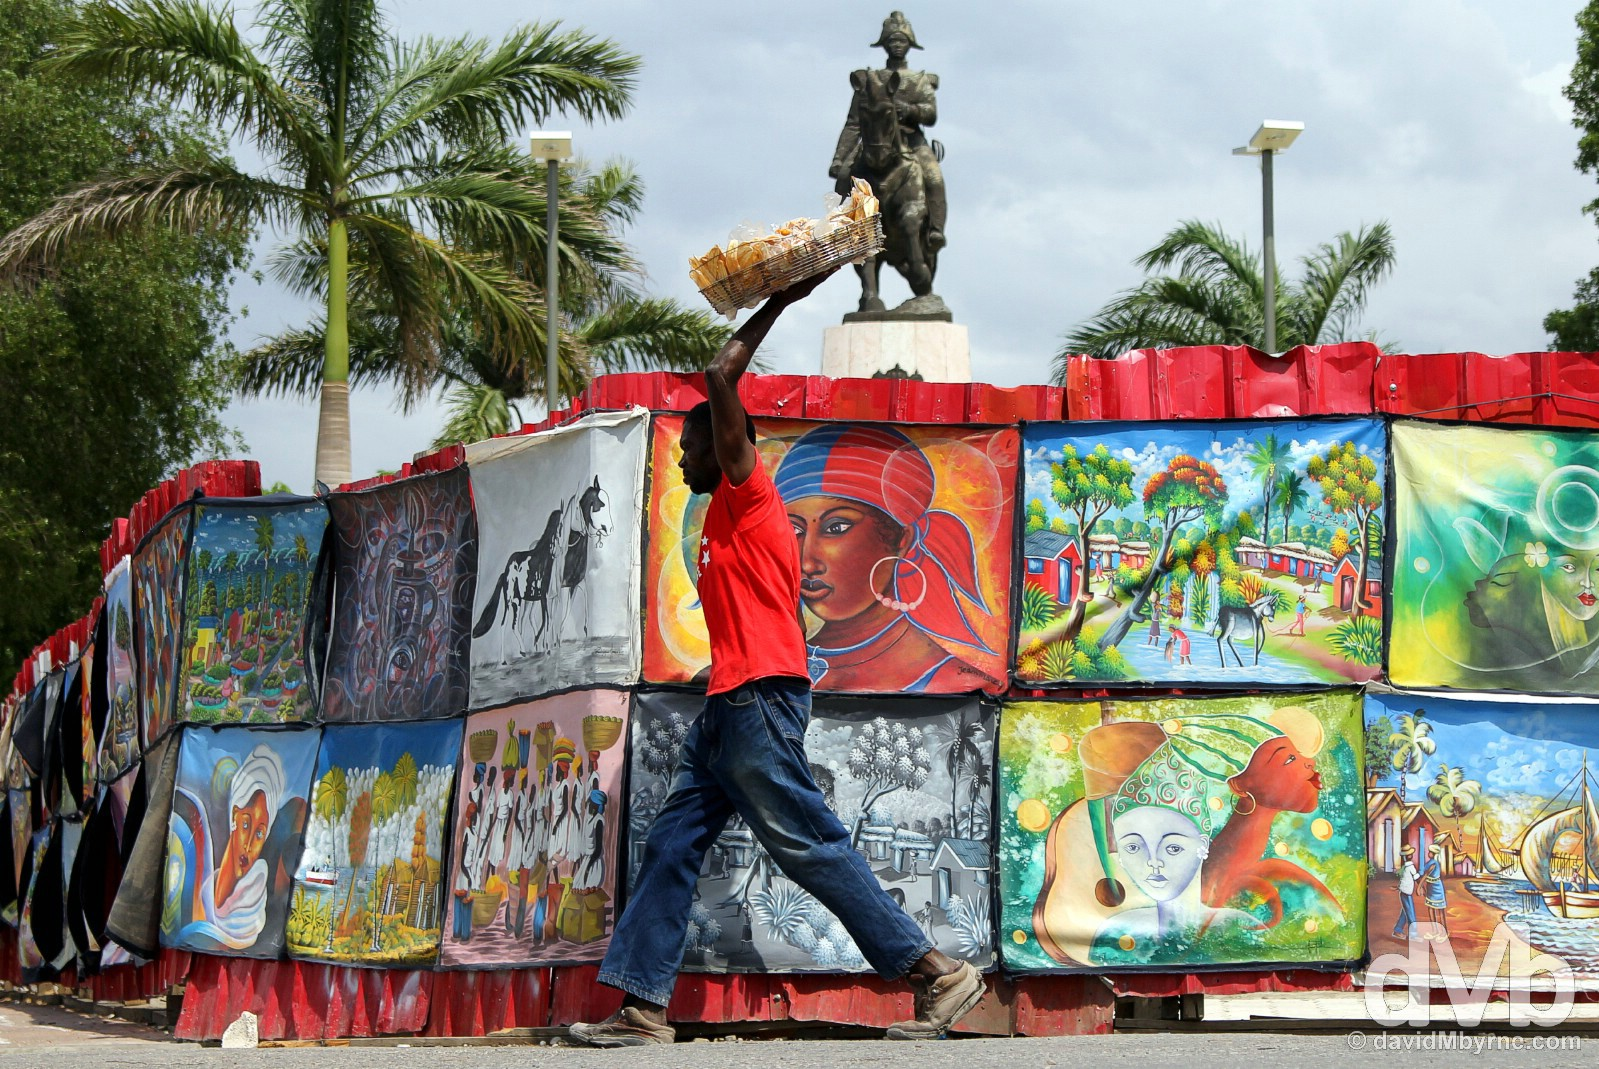 Champs de Mars, Port-au-Prince, Haiti. May 17, 2015.